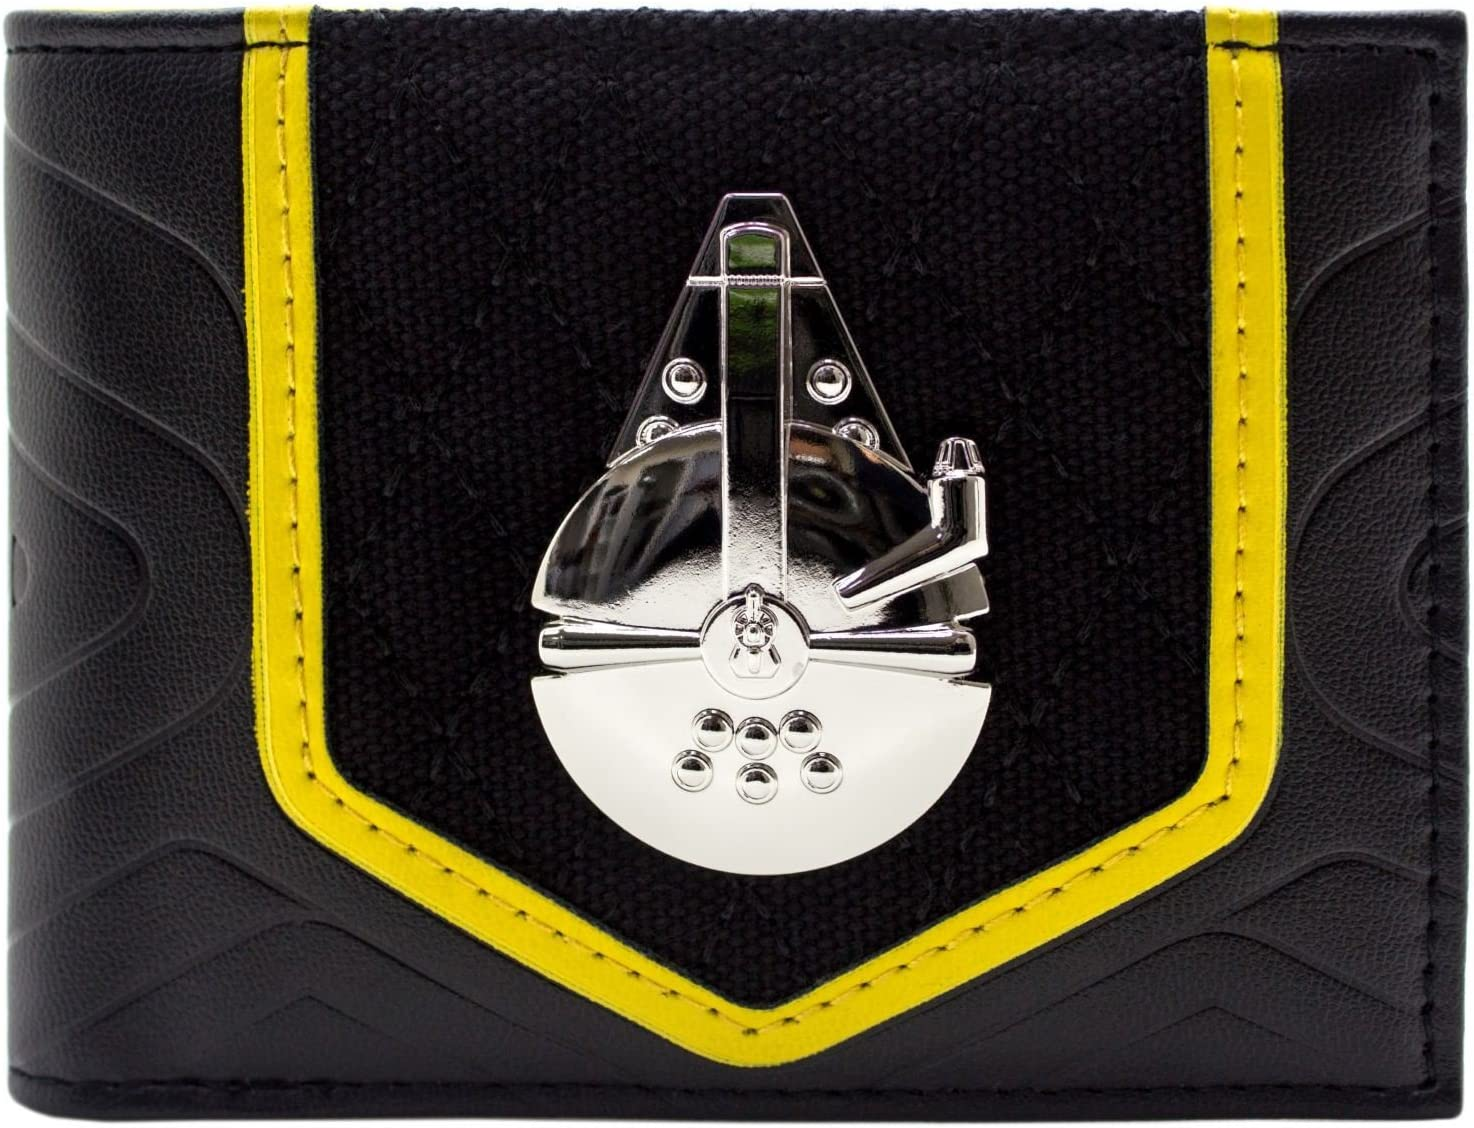 Star Wars MILLENNIUM FALCON Wallet Bifold Purse Leather Money Bag Card Holders